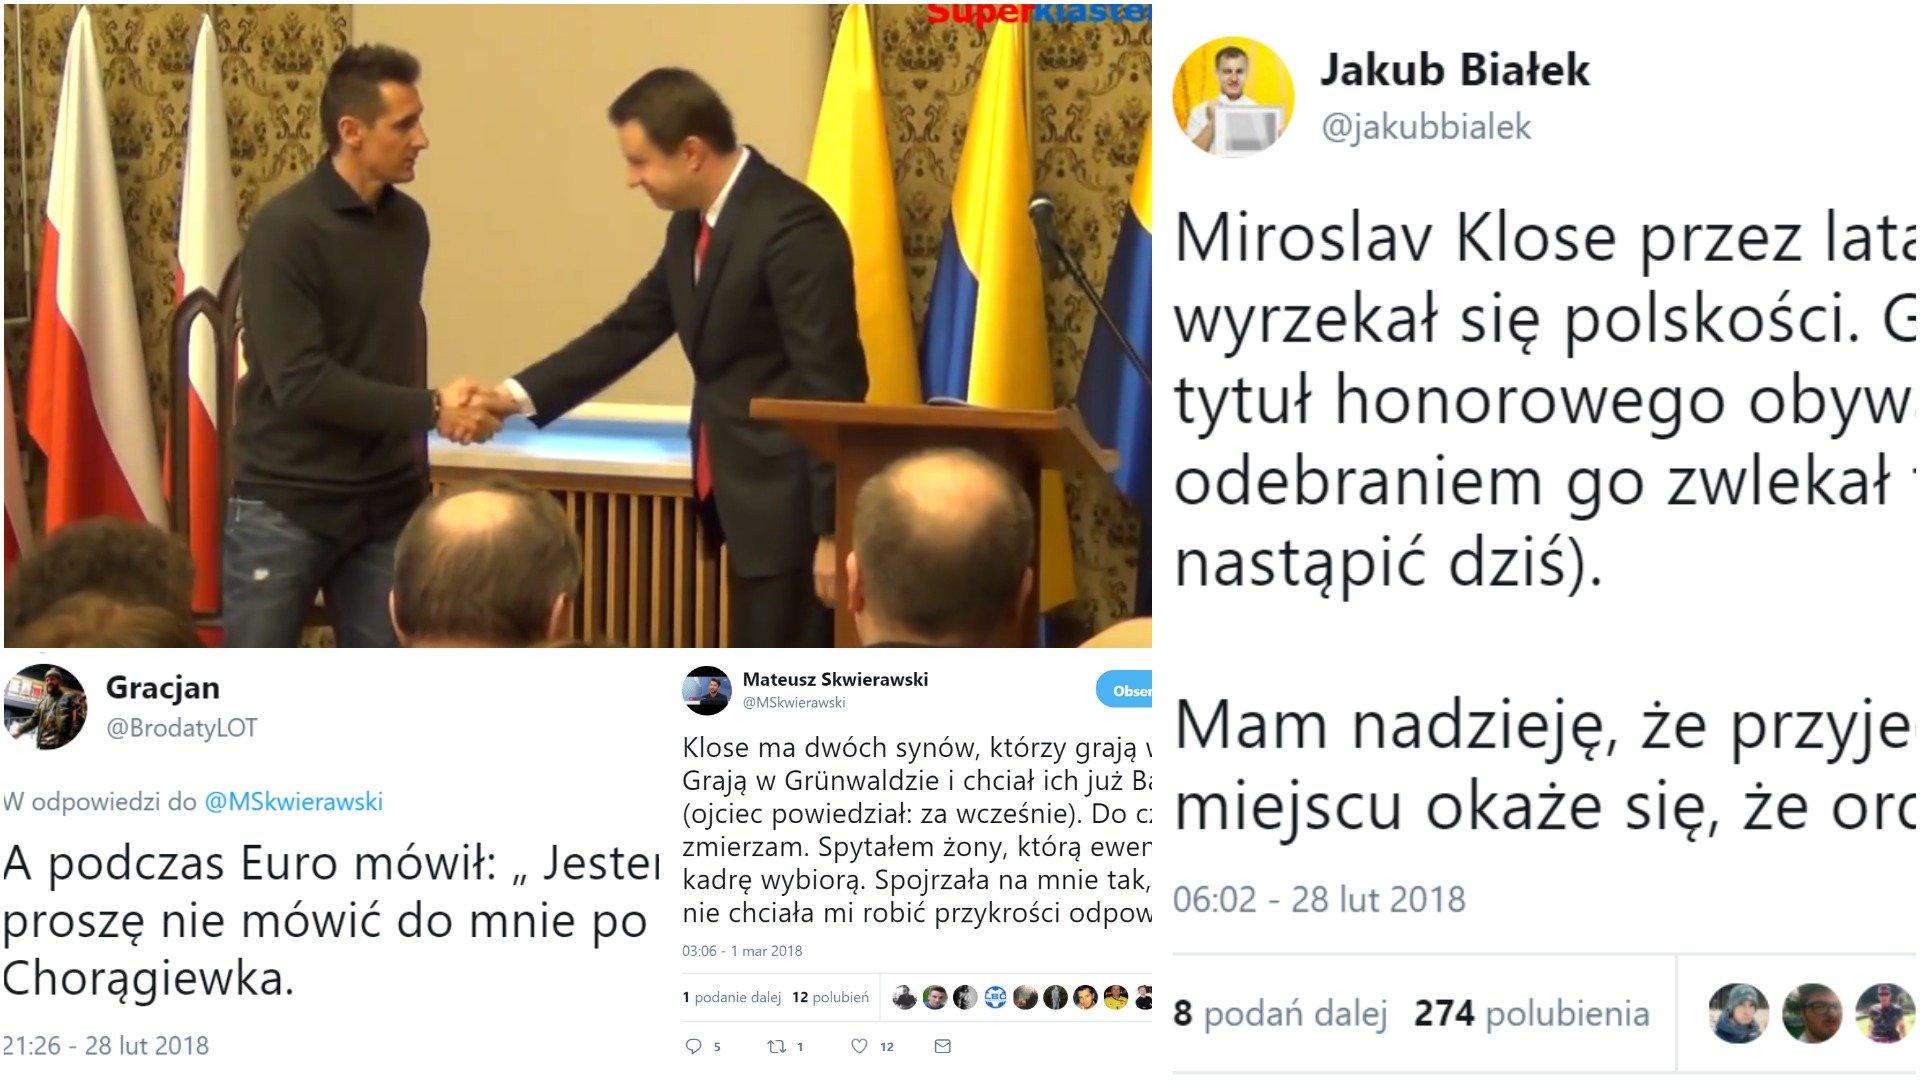 Miroslav Klose honorowym obywatelem Opola